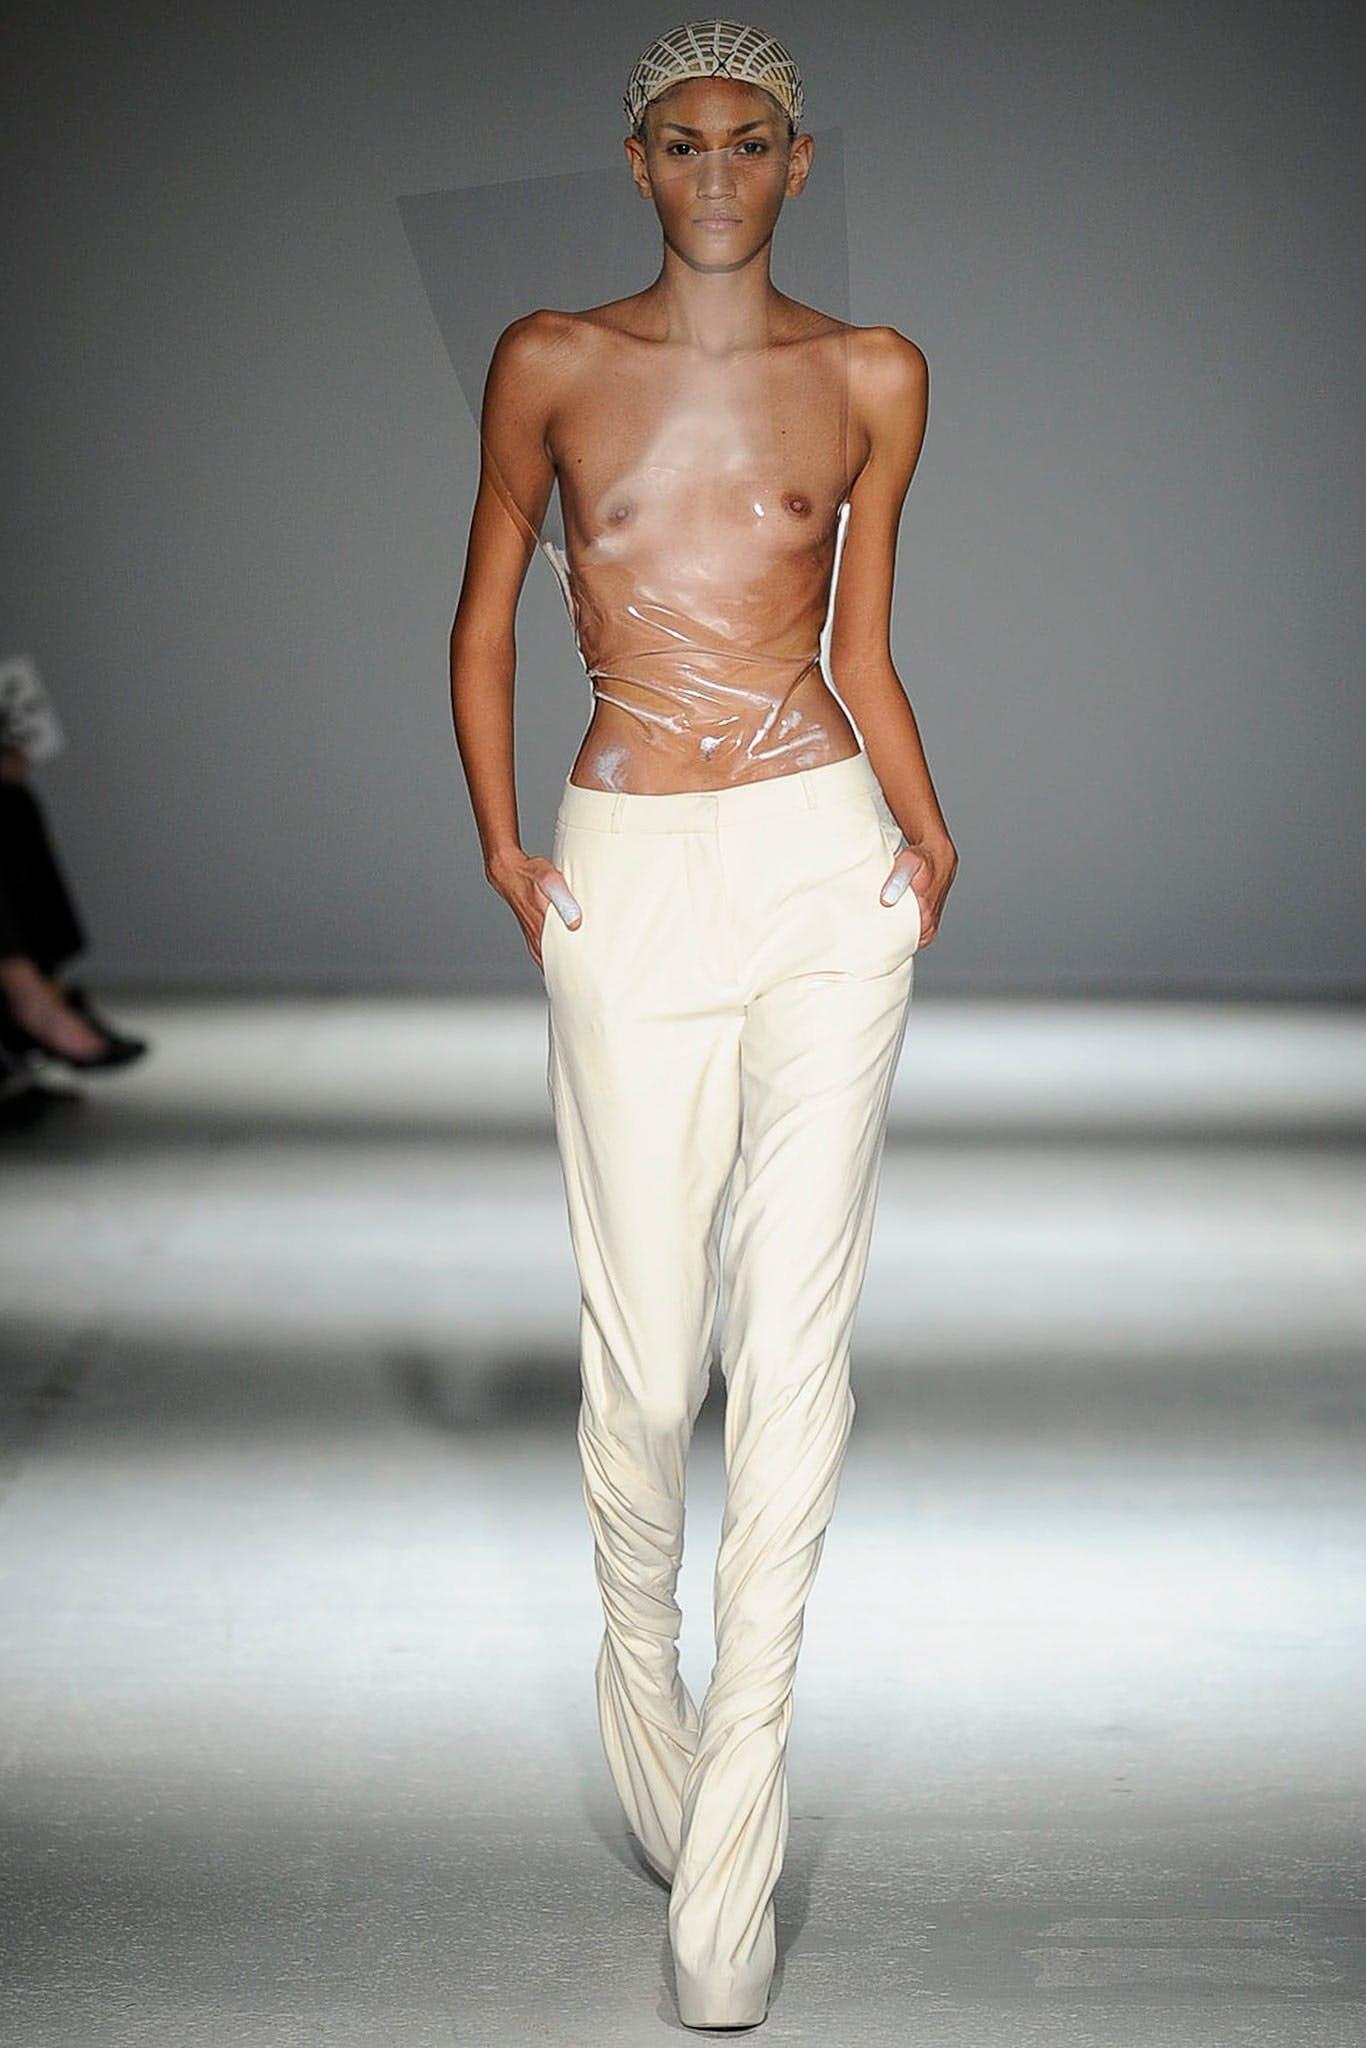 Catwalk topless Category:Topless women